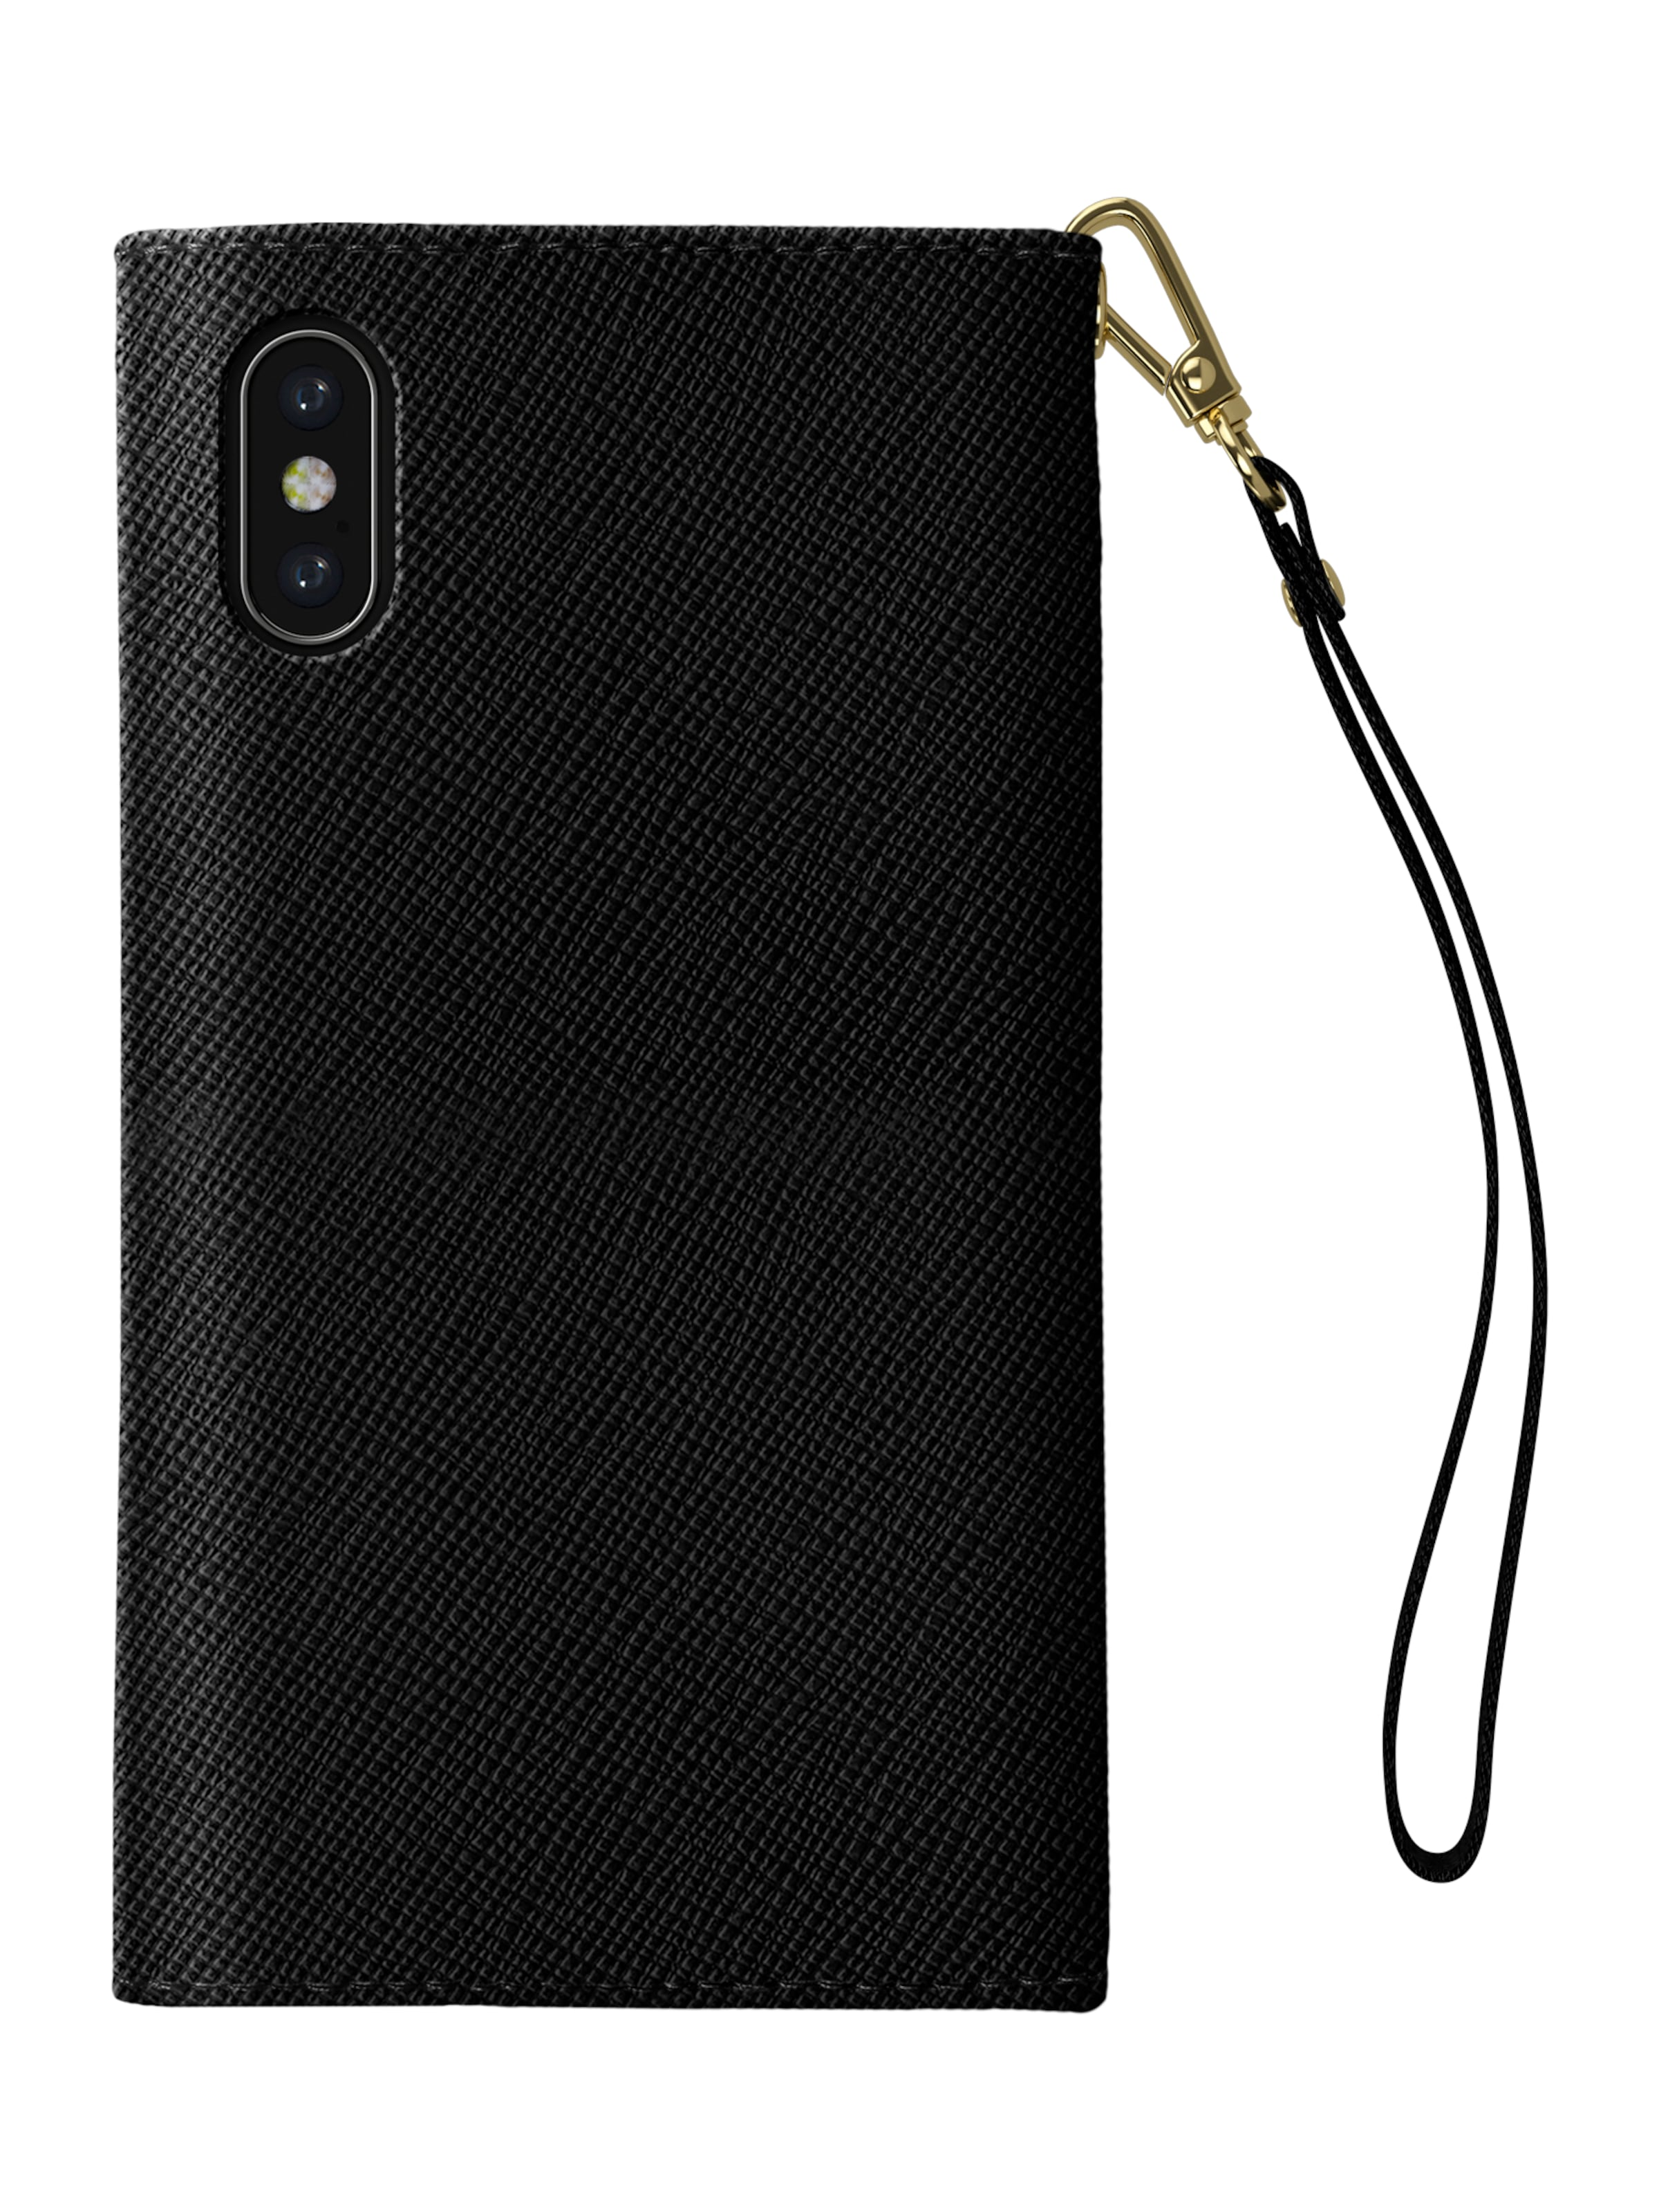 Smartphone En Pour 'mayfair' Protection Ideal Noir Of Sweden v0PynwON8m